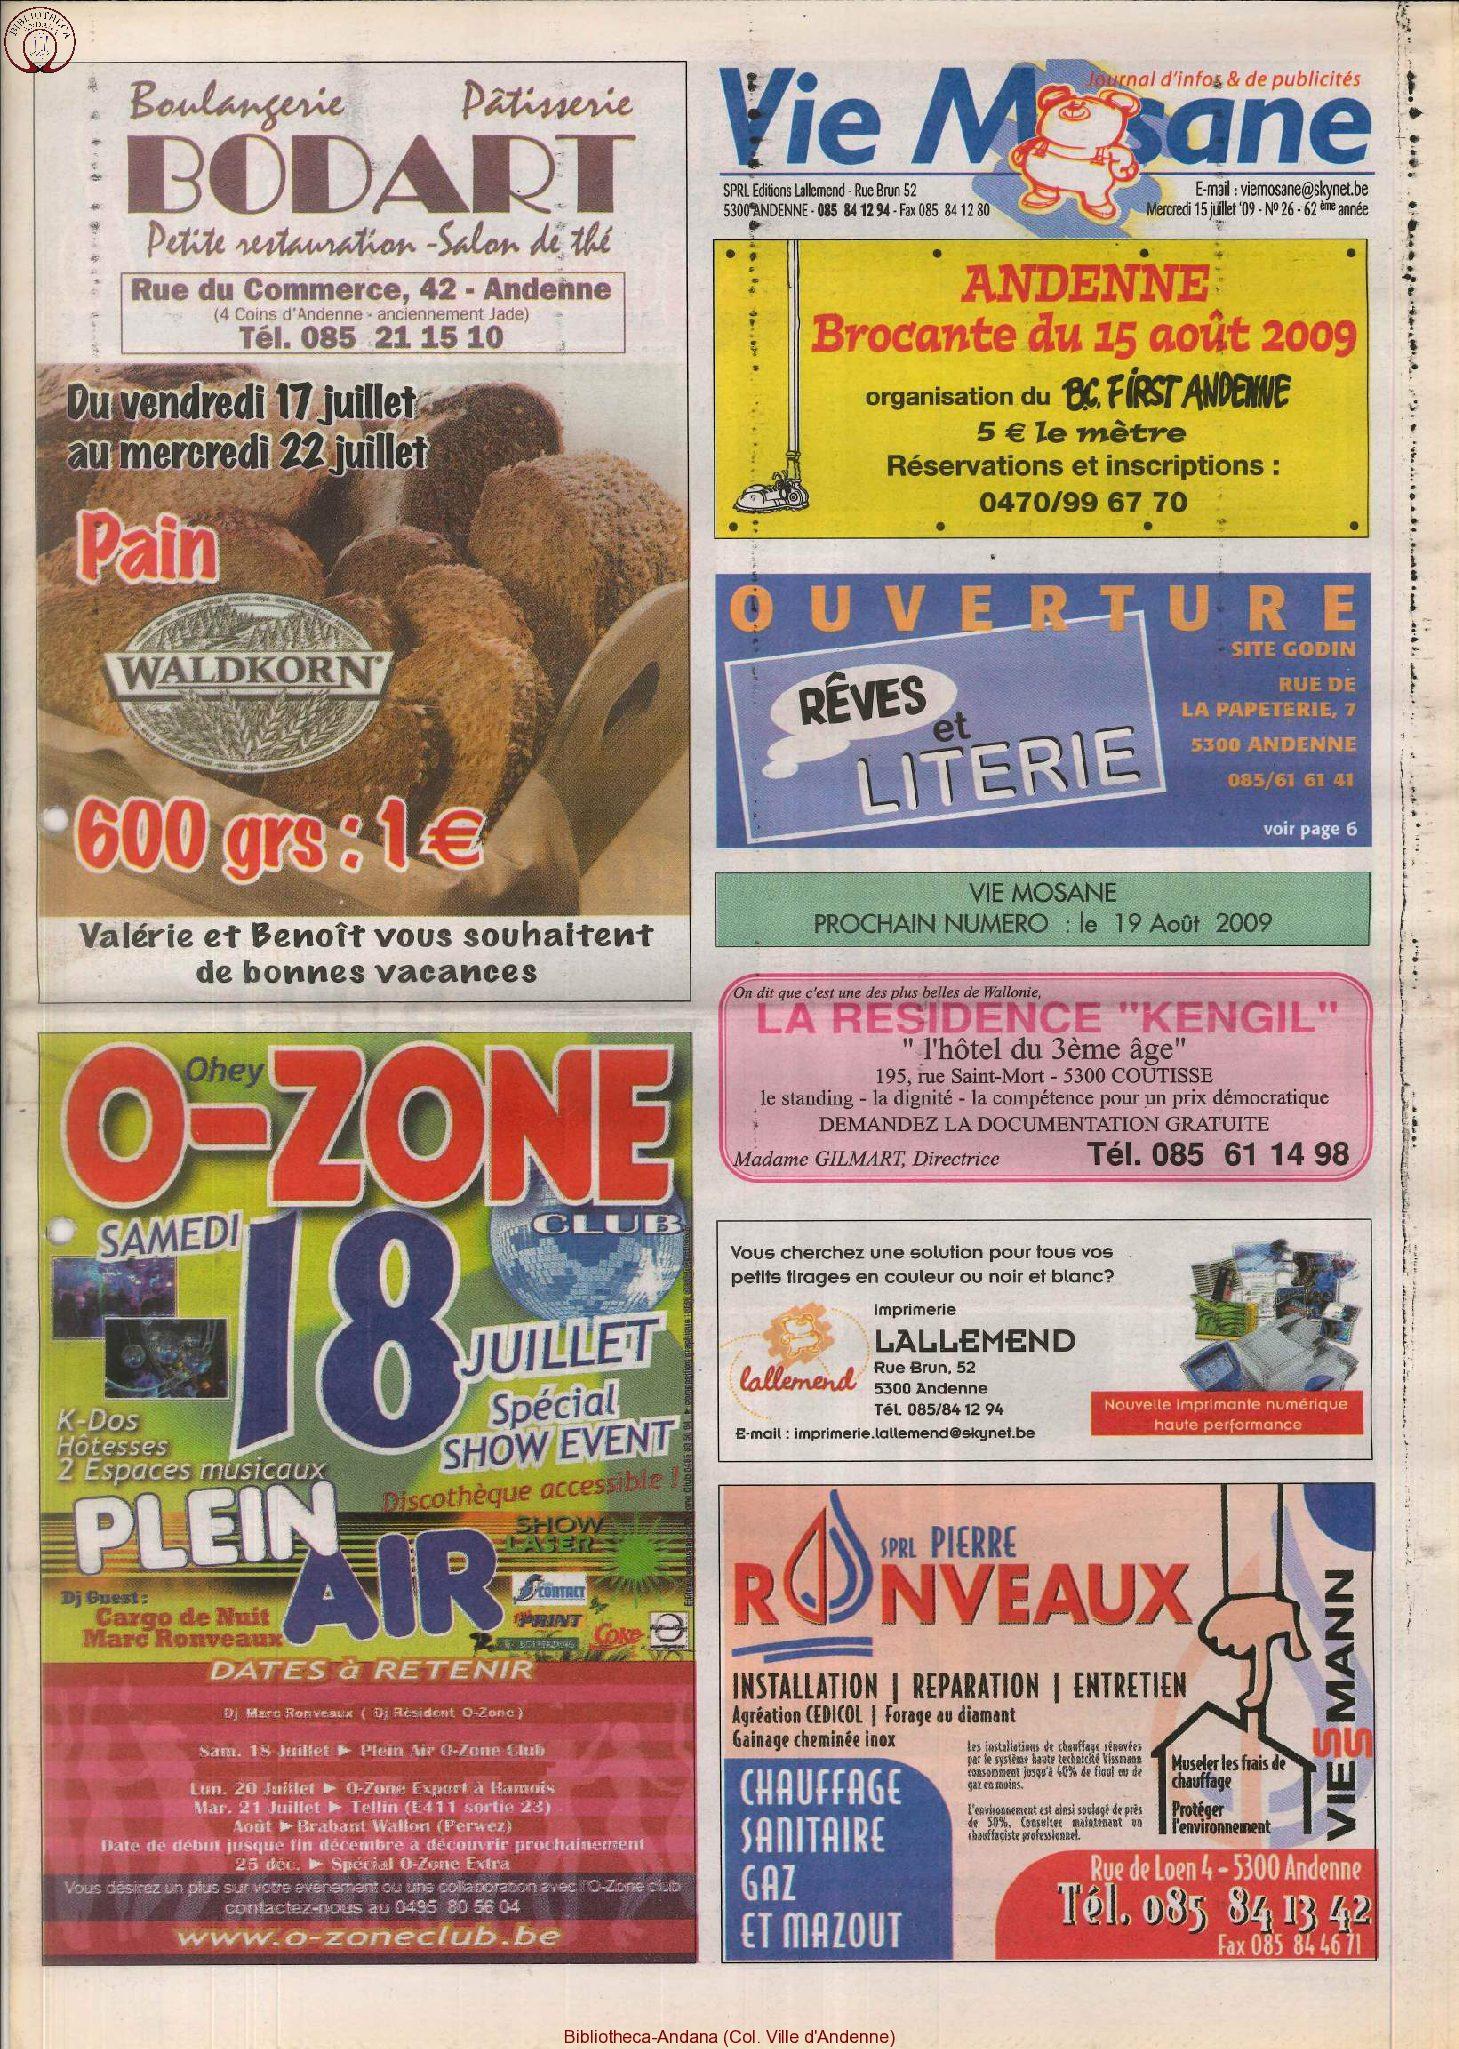 62e année - n°26 - 15 juillet 2009